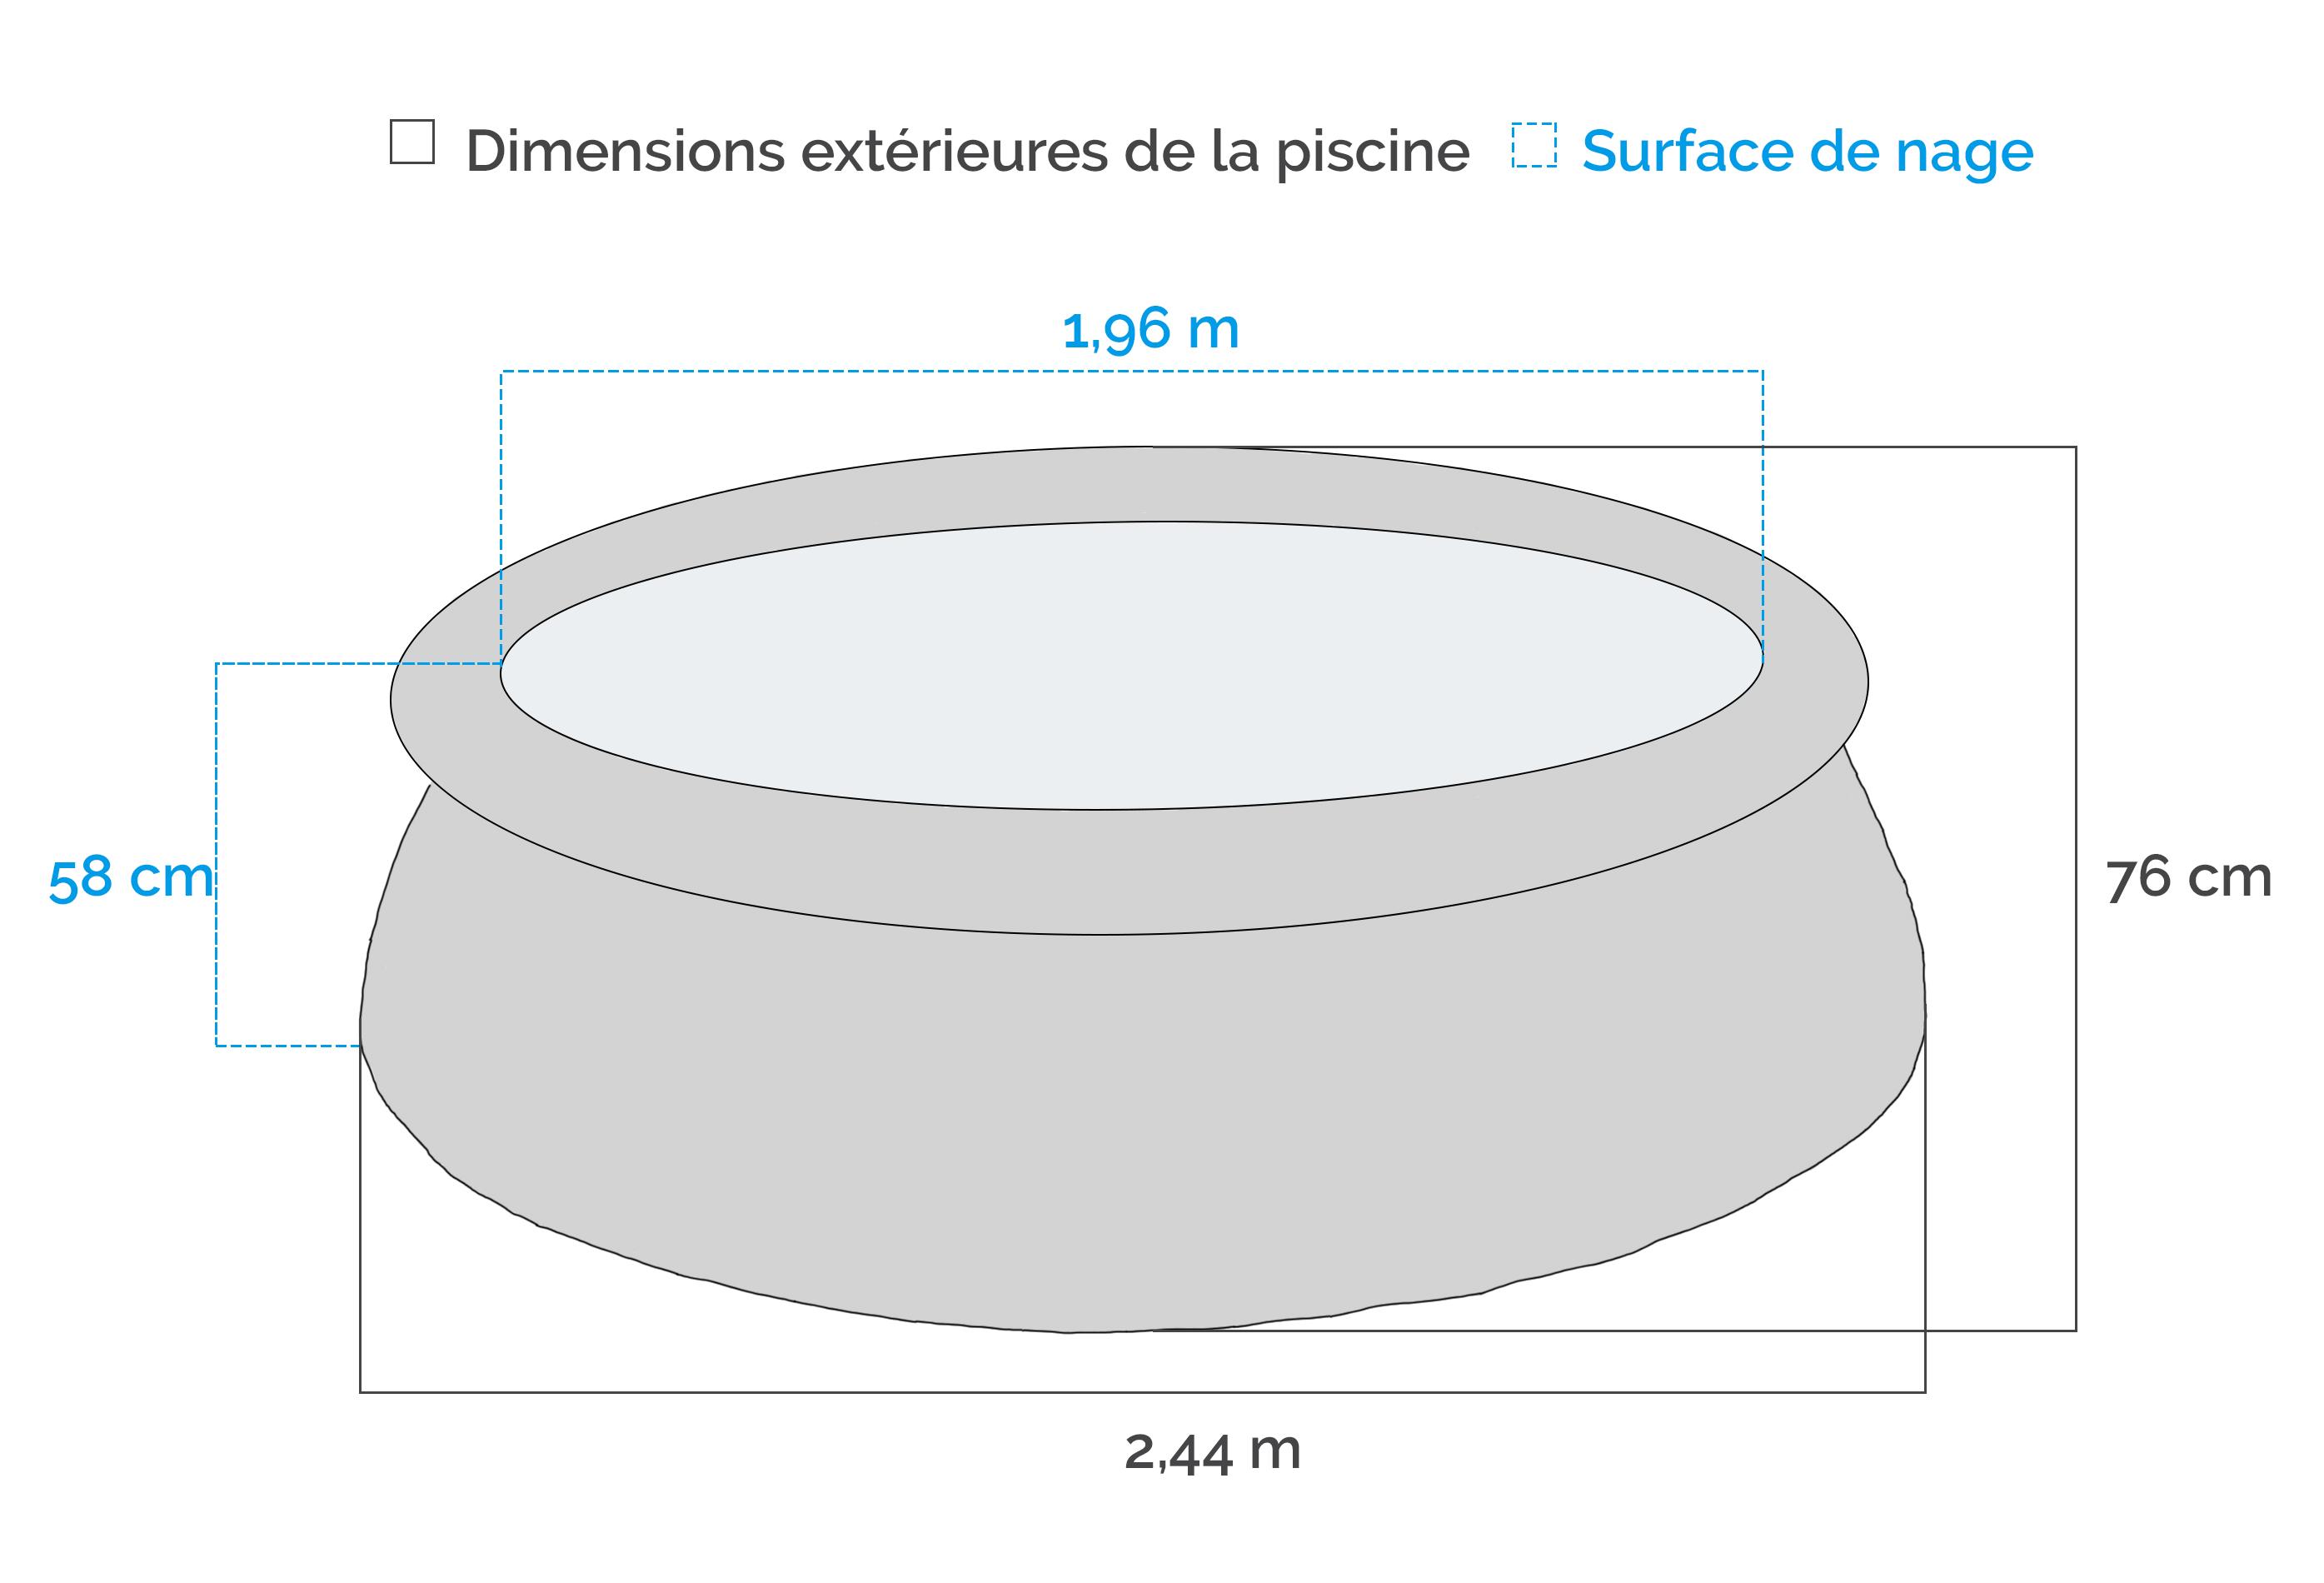 Piscine autoport e easy set intex 2 44 x 0 76 m - Piscine autoportante intex easy set ...